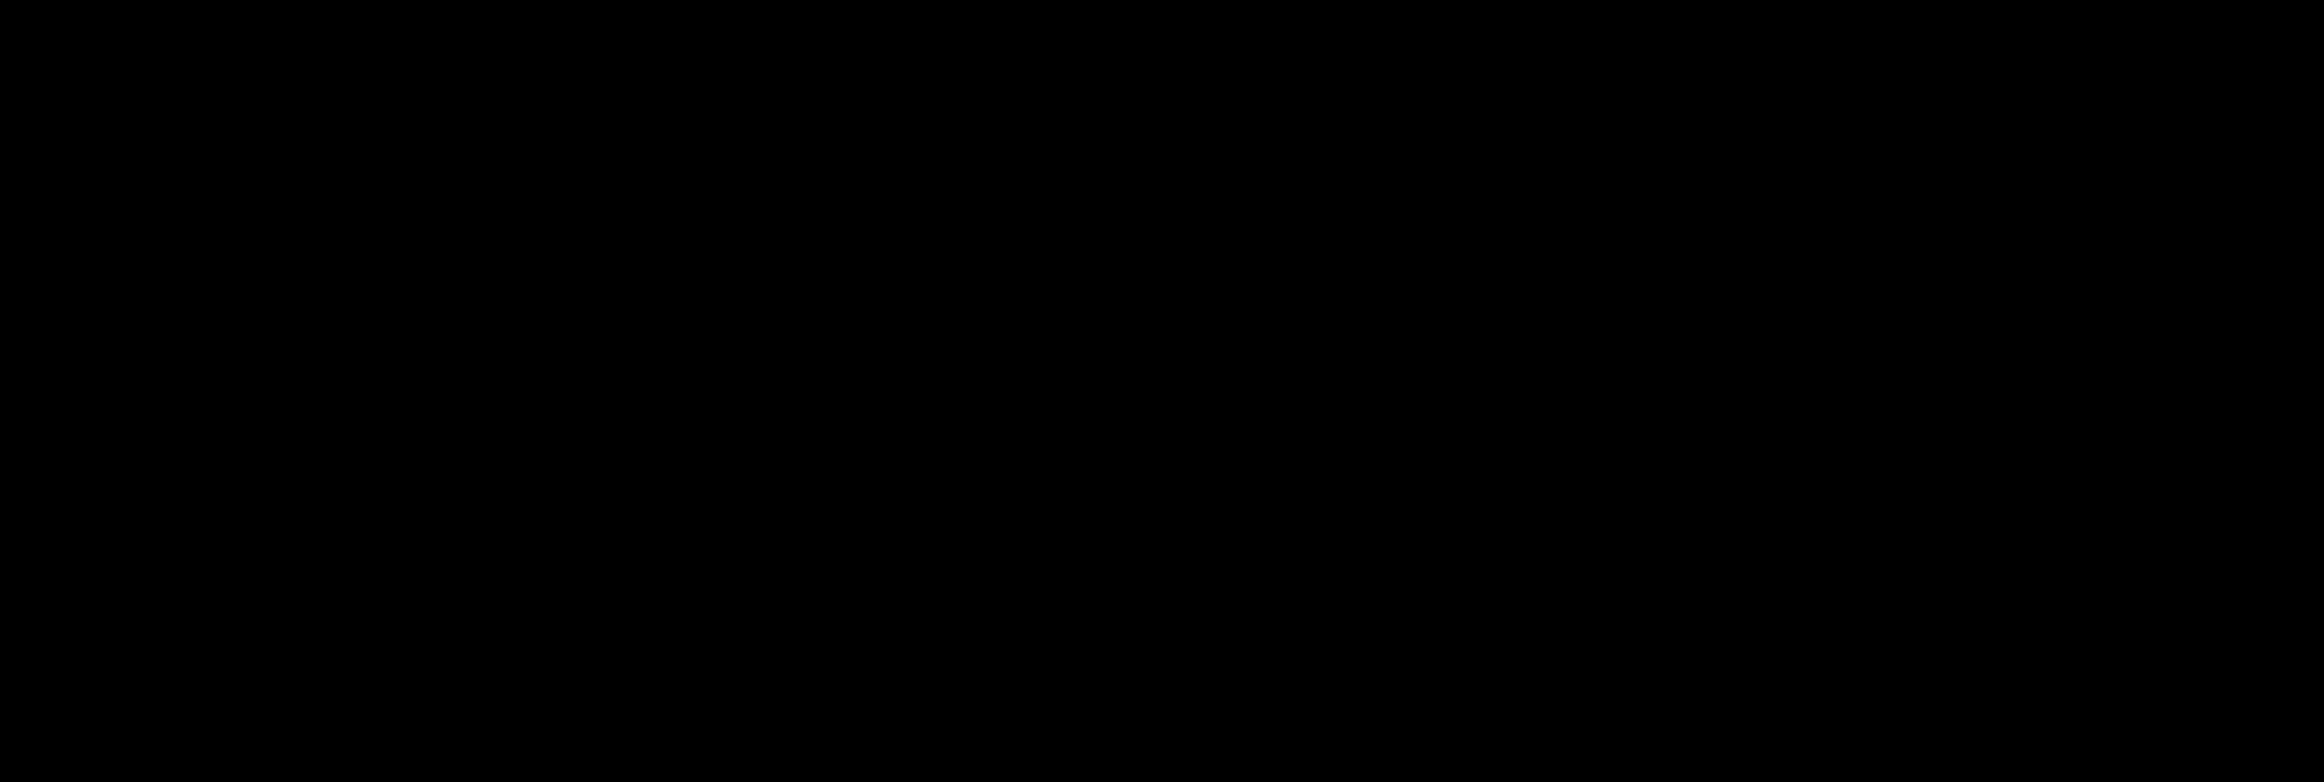 N-5-Biotinoylaminopentanoylpropargylamine